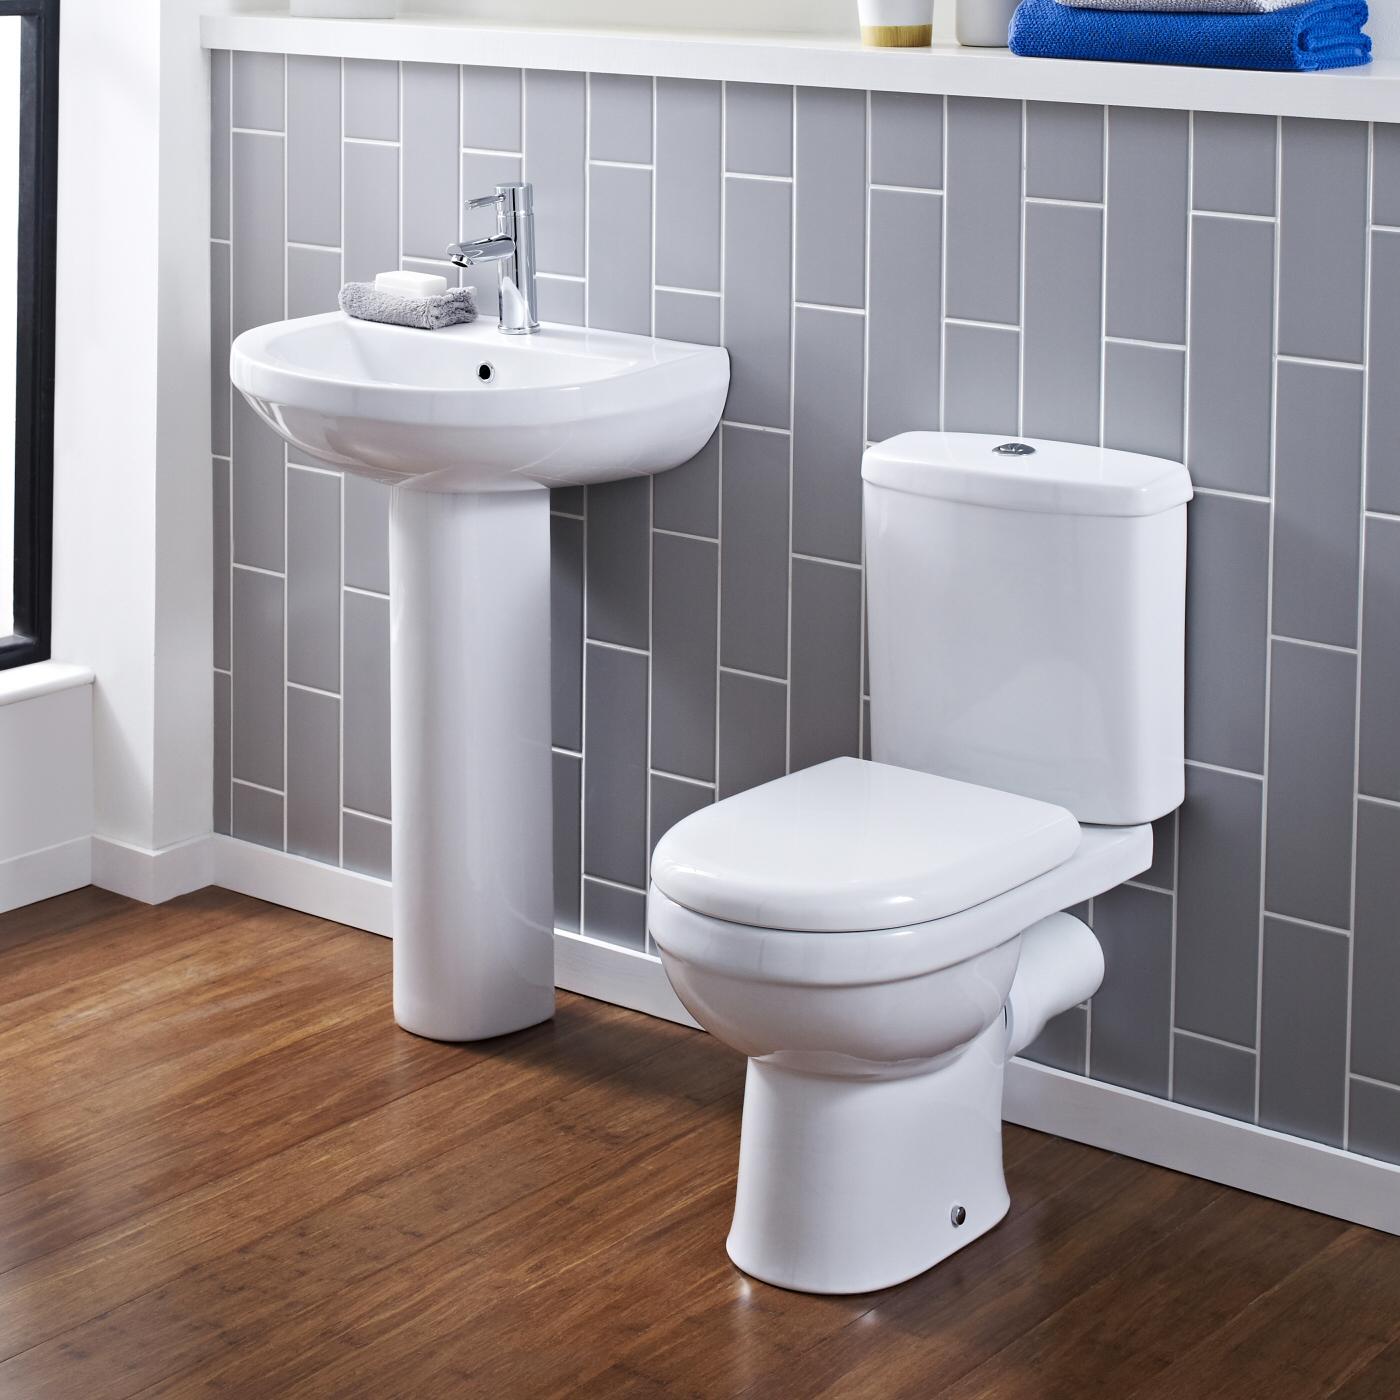 Bathroom Uk Designer Luxury Bathrooms Online At Big Bathroom Shop Uk